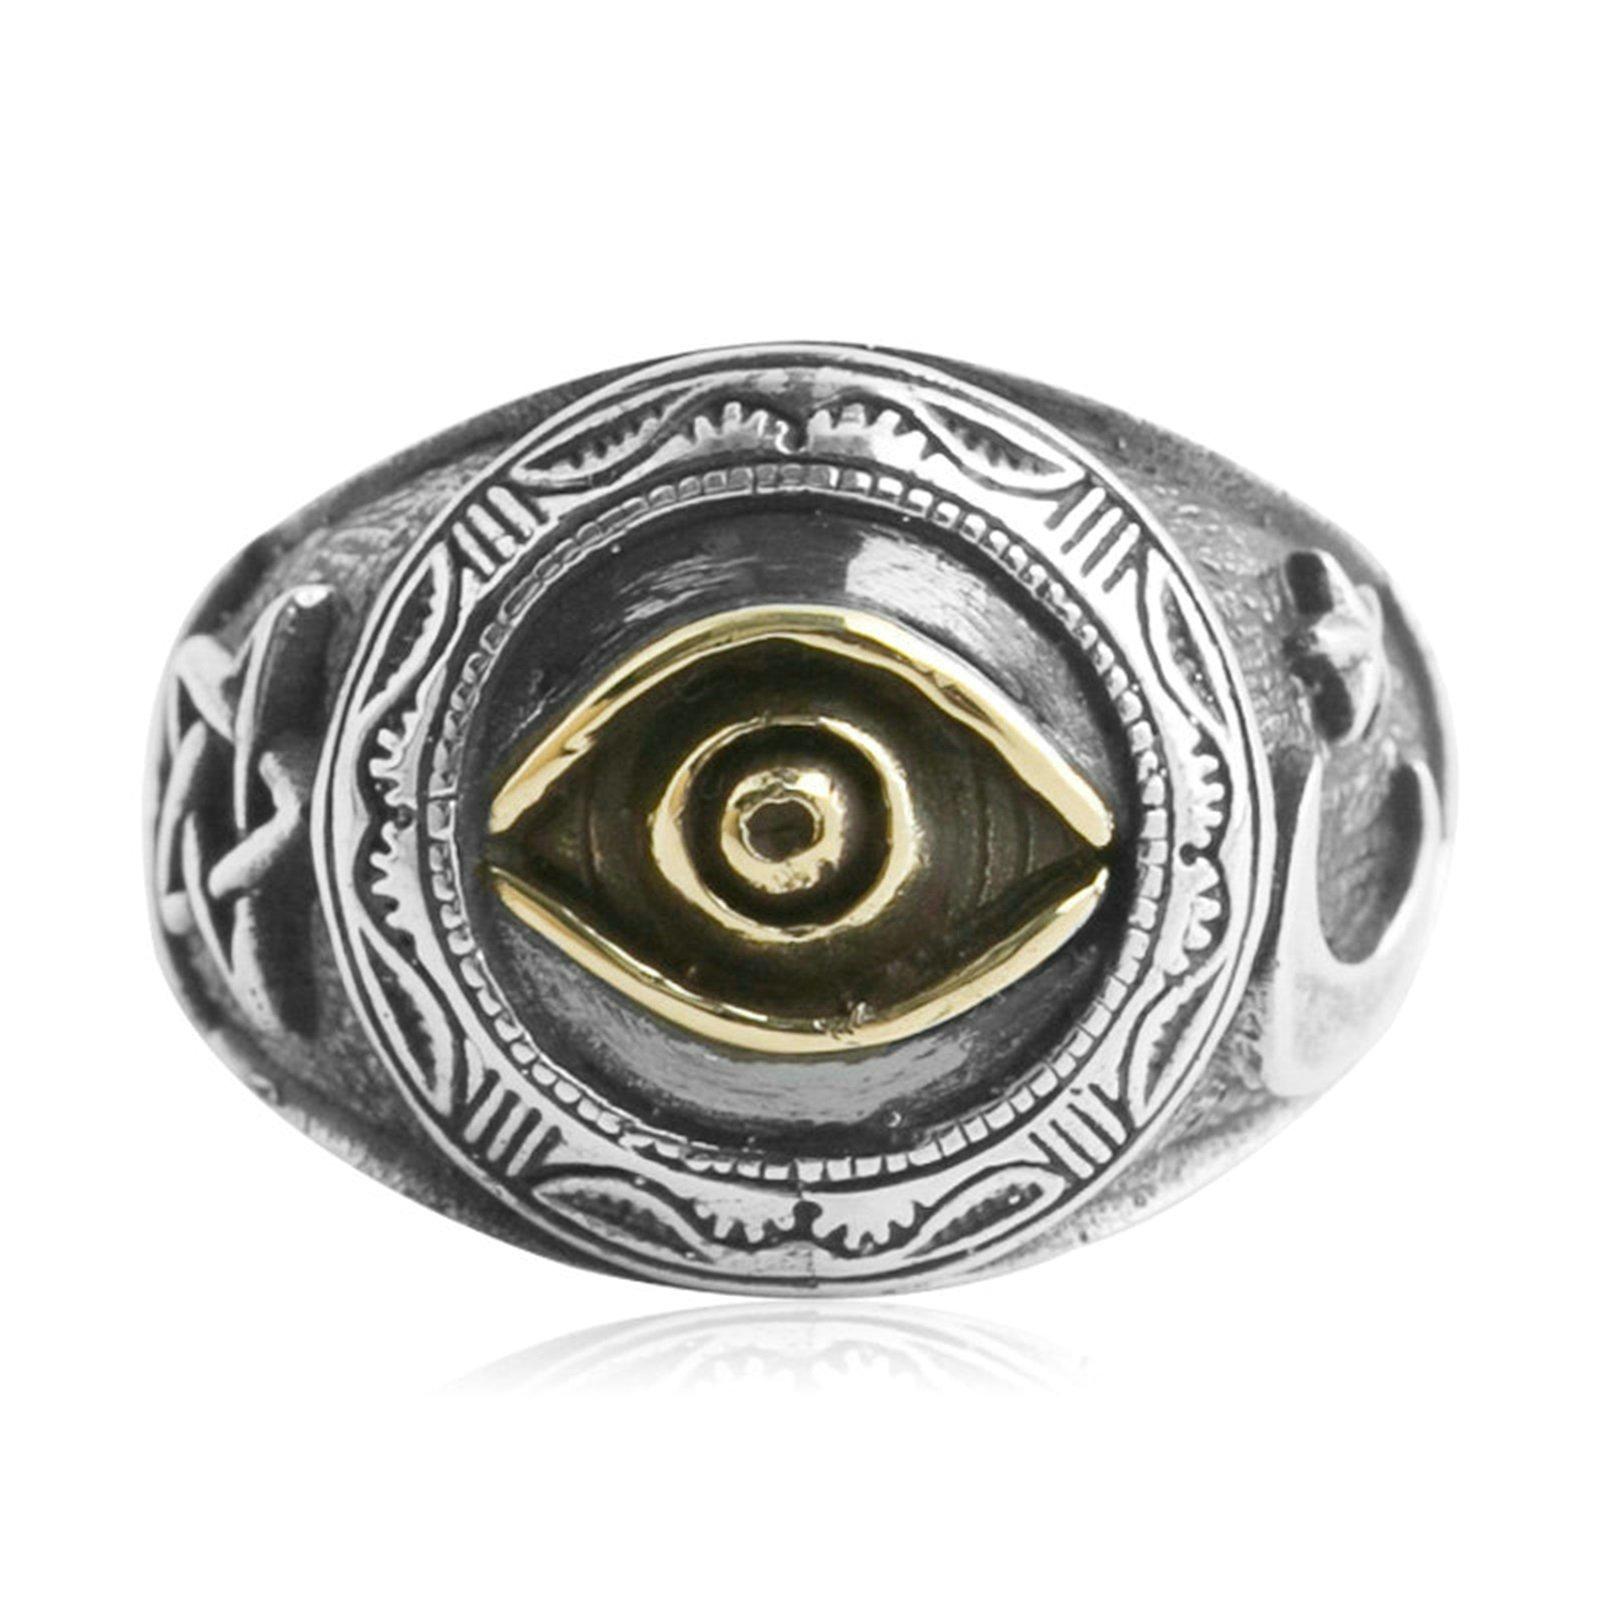 Beydodo Mens Silver Ring, The Eye Of God Star Moon Ring Size 11 Punk Biker Ring Bands